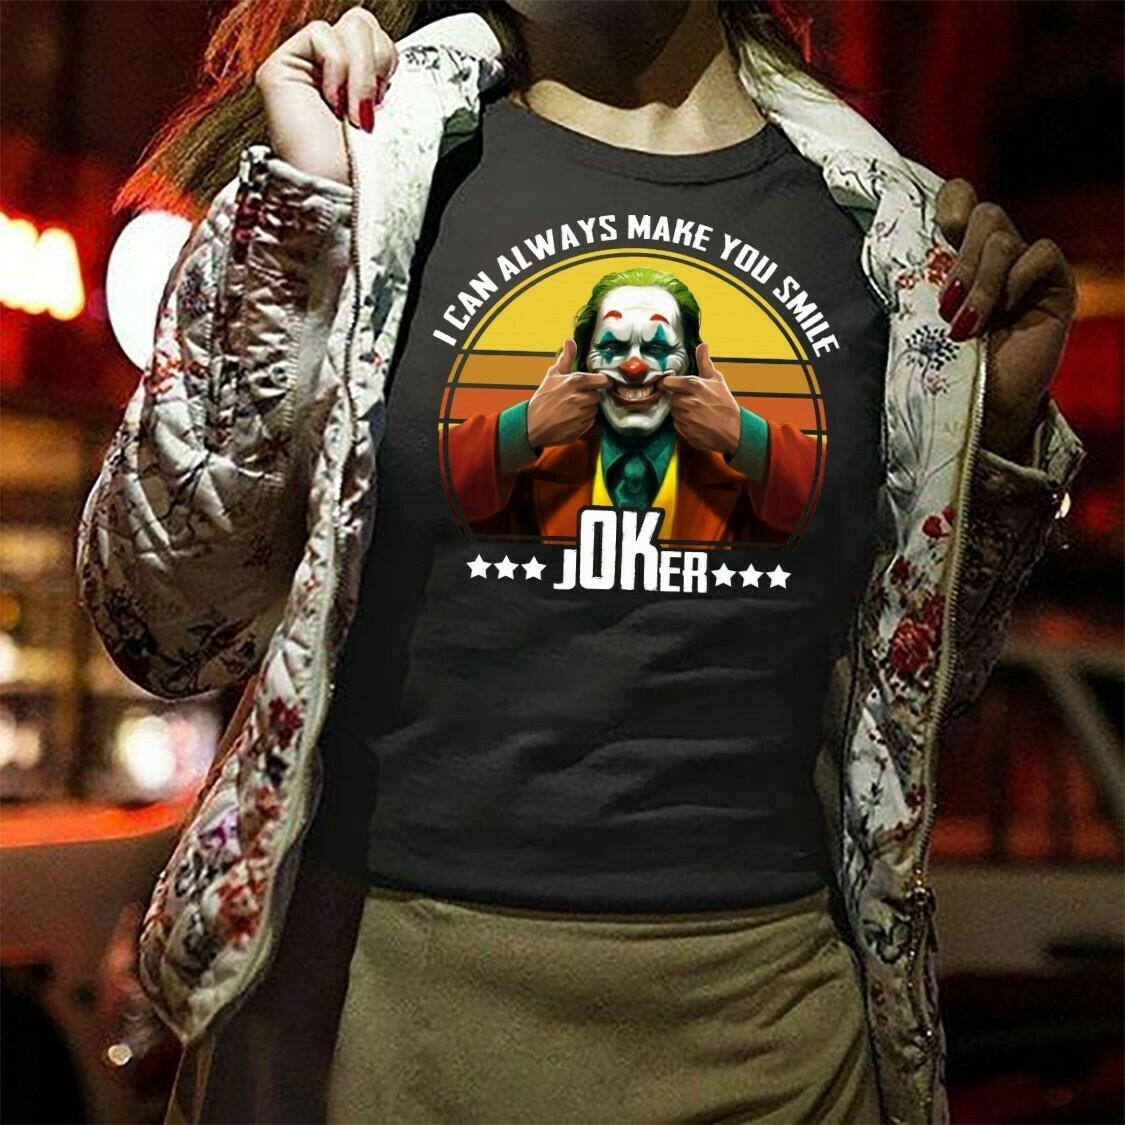 Joaquin Phoenix Joker 2019 I Can Always Make You Smile jOKer Gift For Fans Here Comes Your Favorite Villain Halloween Horror Movie T-Shirt Long Sleeve Sweatshirt Hoodie Jolly Family Gifts